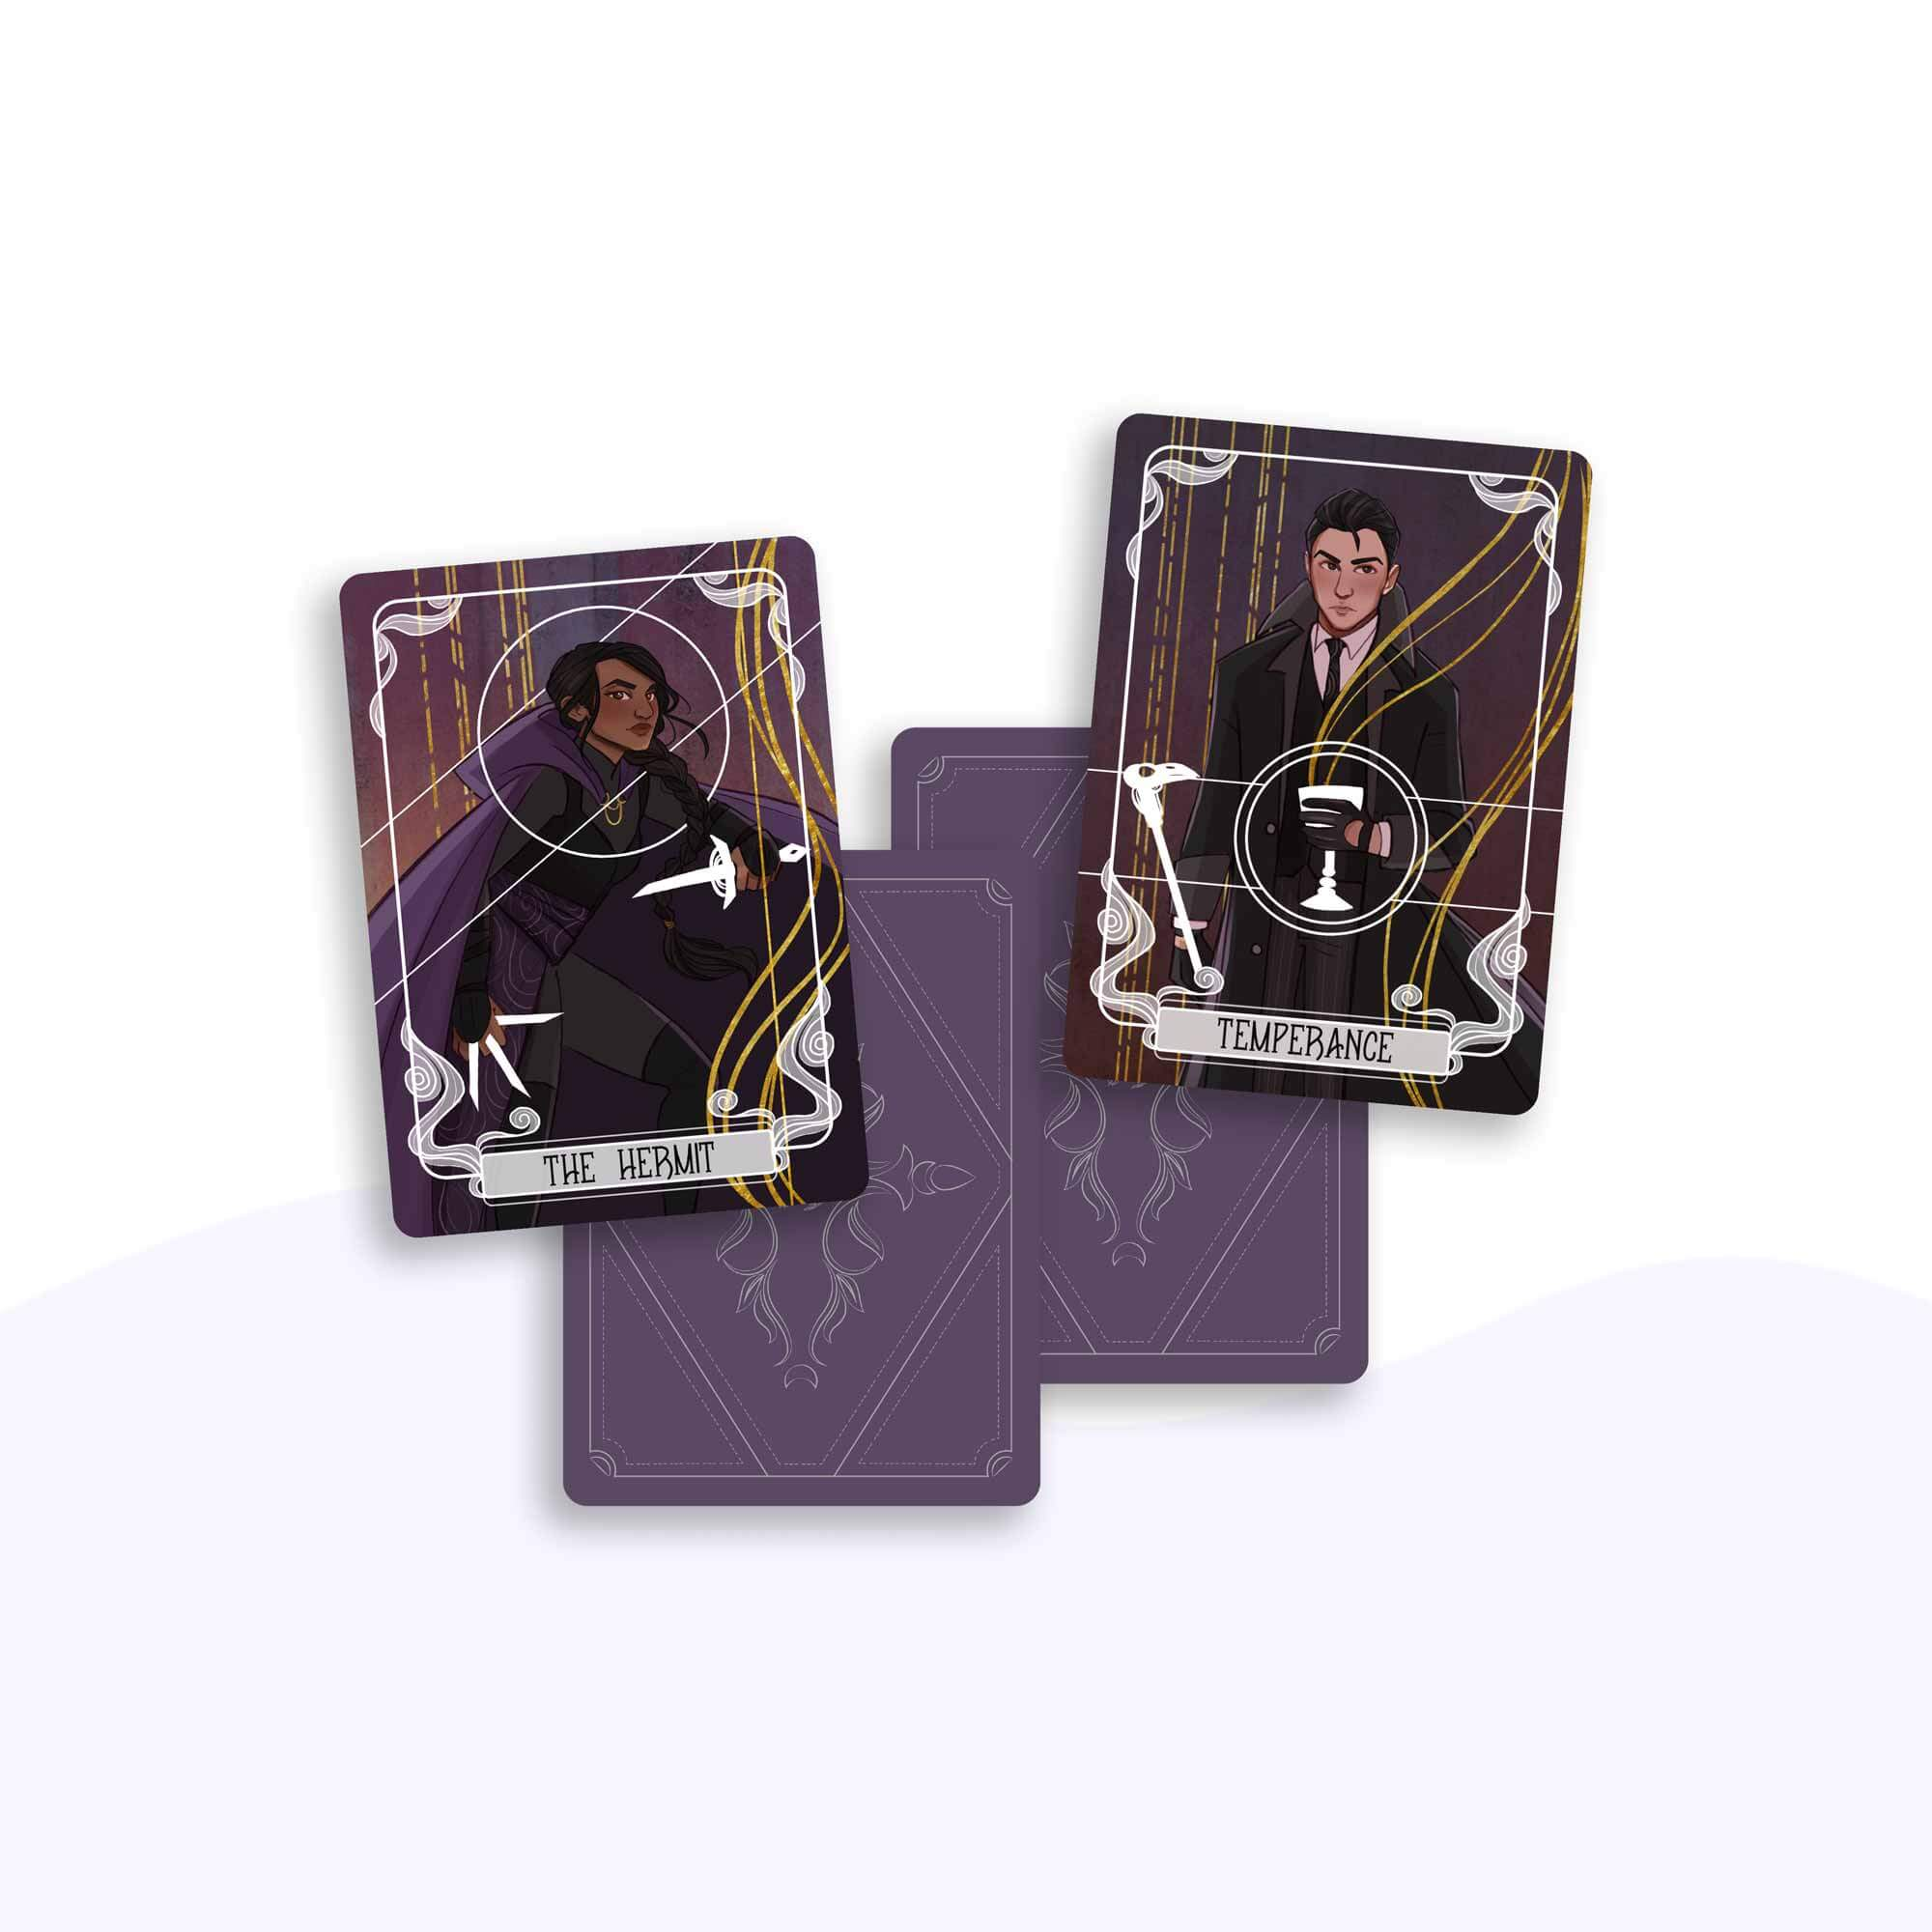 The Hermit & Temperance Tarot Cards